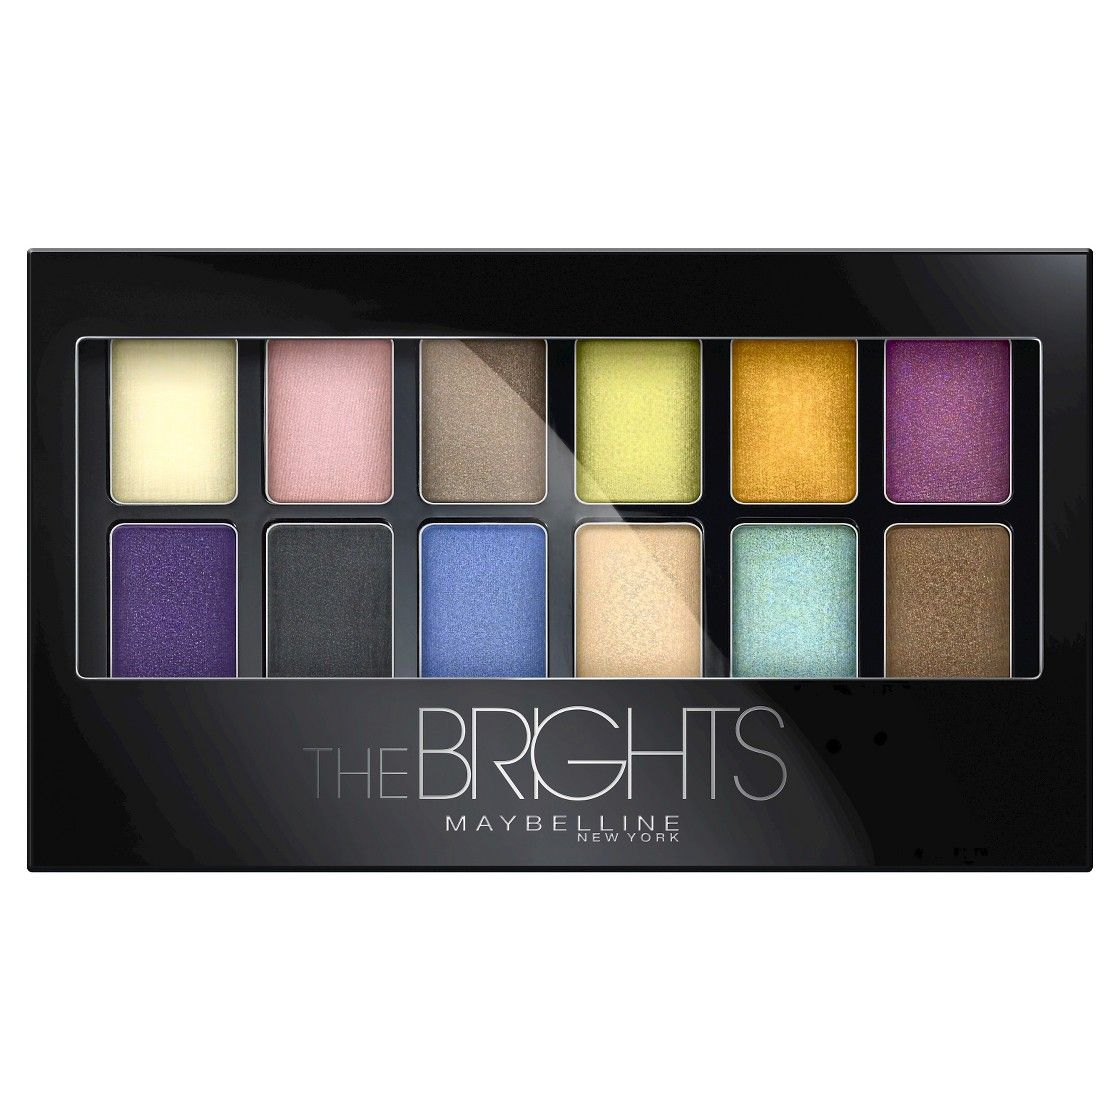 Maybelline Eyeshadow Palette 0.34 oz Maybelline